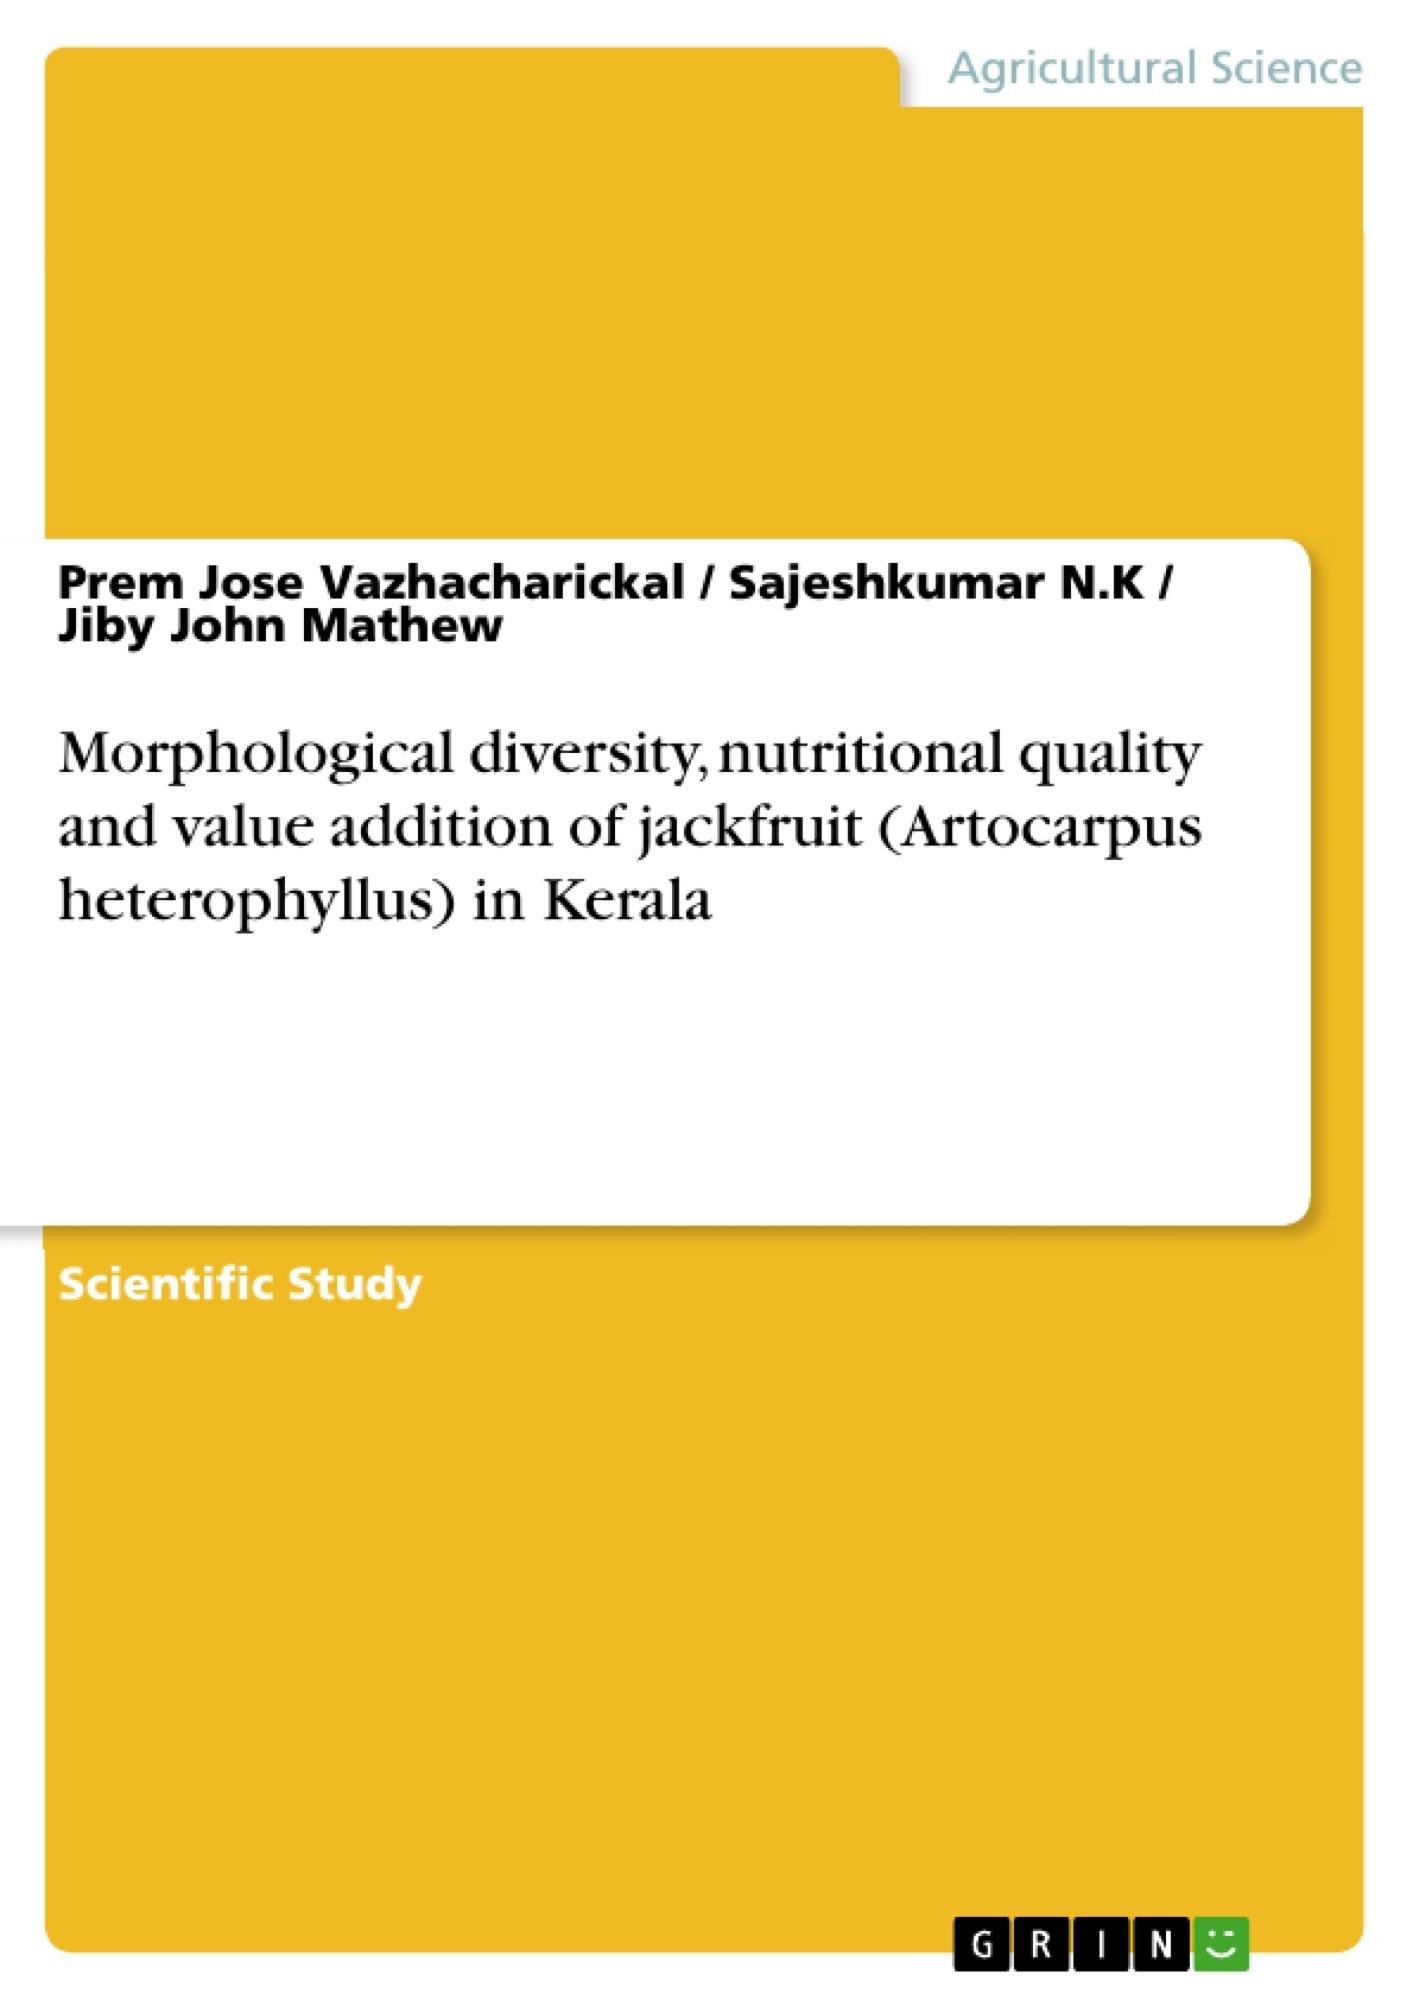 Title: Morphological diversity, nutritional quality and value addition of jackfruit (Artocarpus heterophyllus) in Kerala